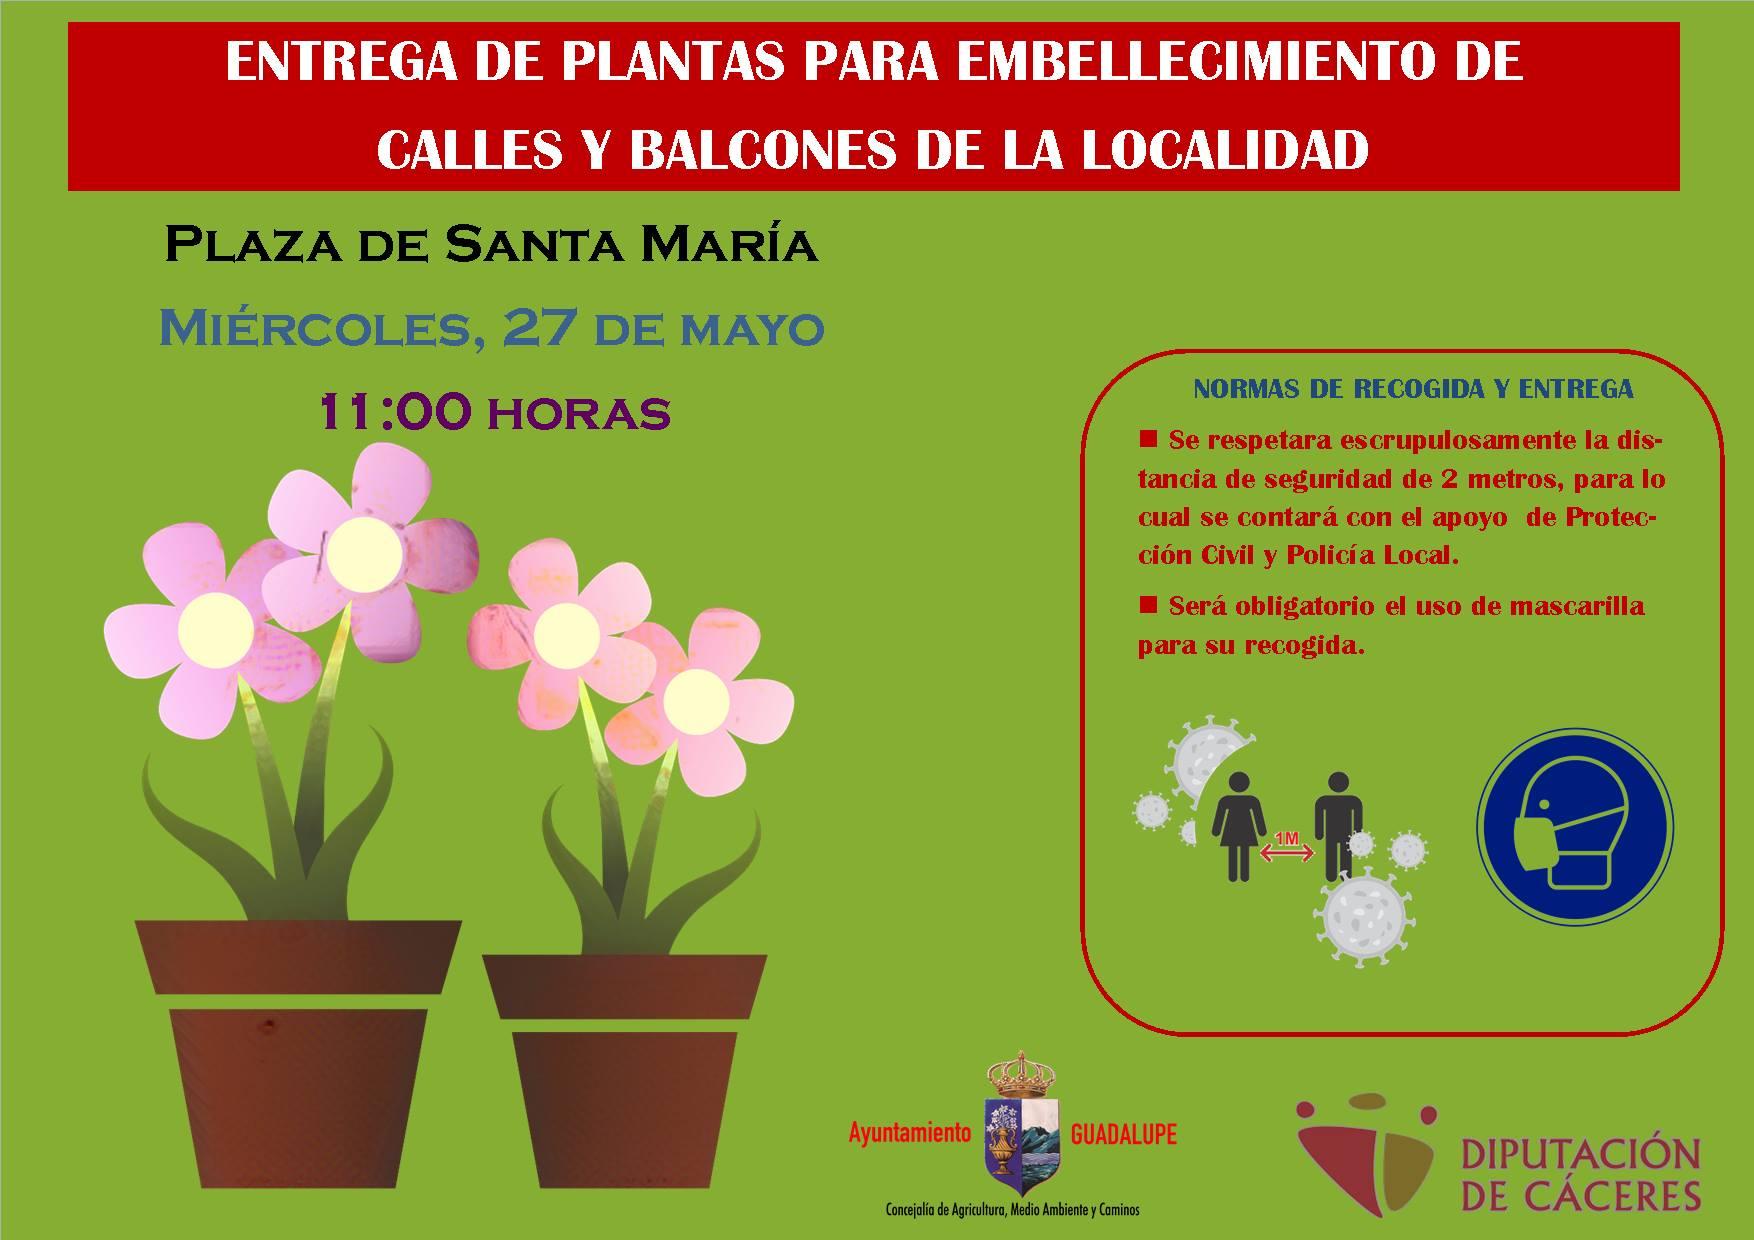 Entrega de plantas para embellecer 2020 - Guadalupe (Cáceres)